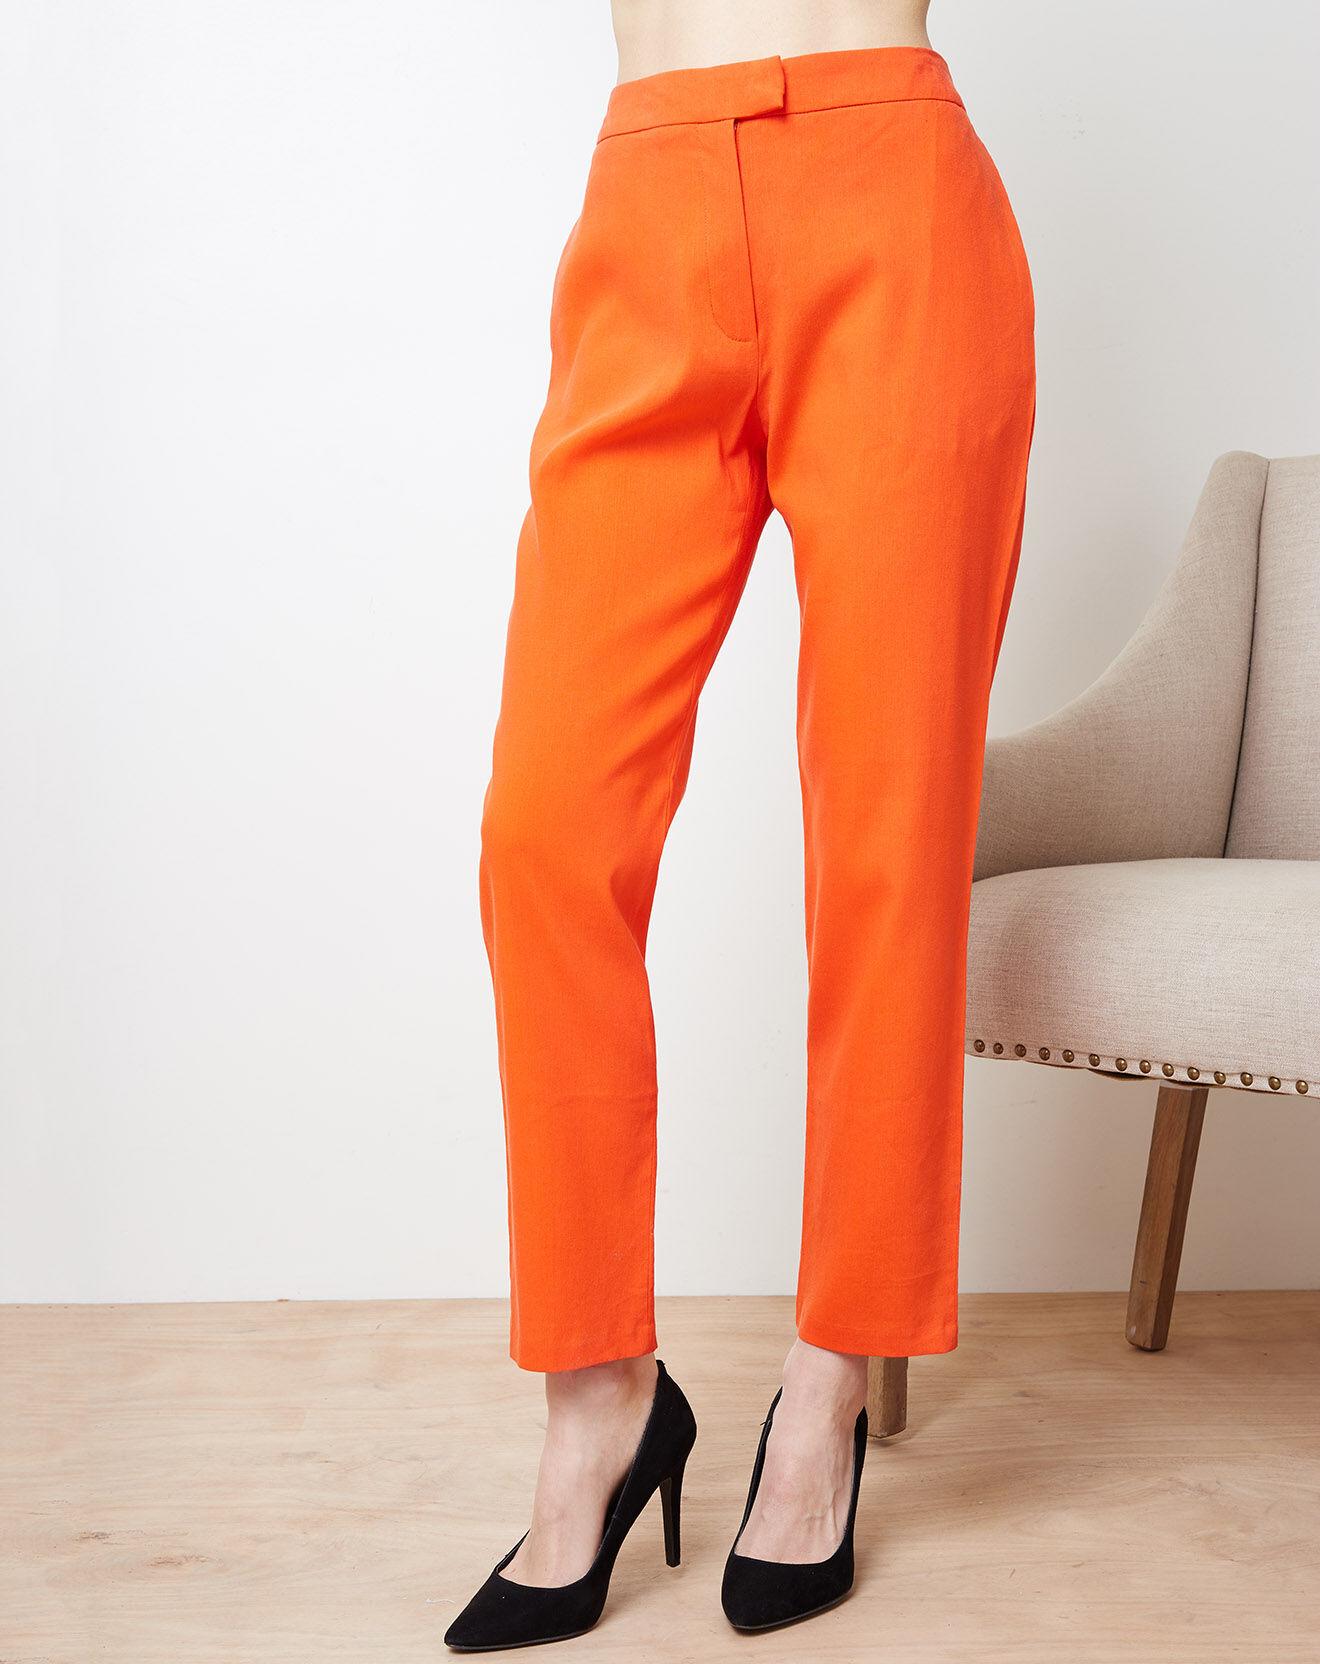 Pantalon en Lin mélangé Capri orange - Cacharel - Modalova